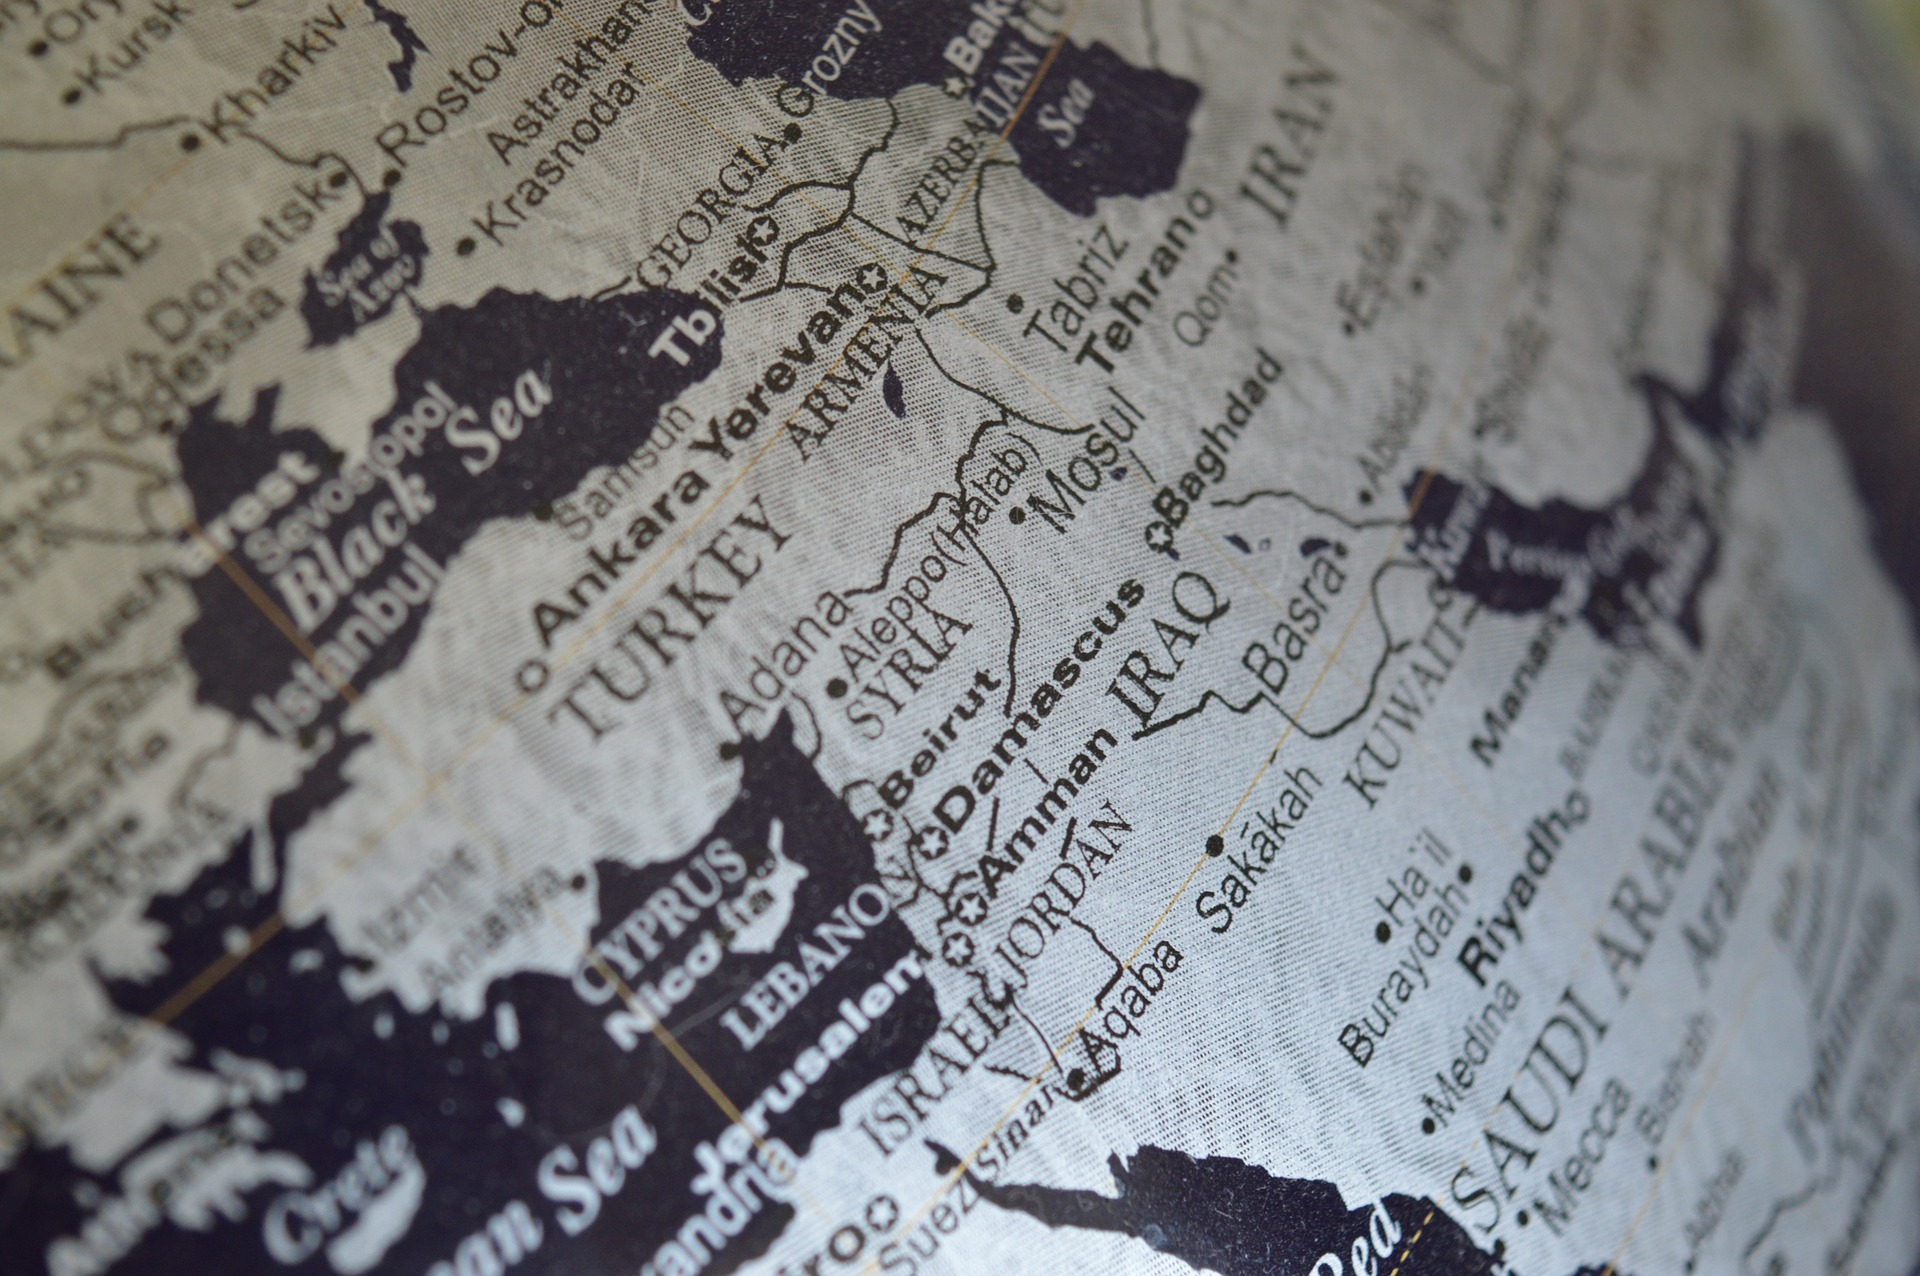 Syria Political Map